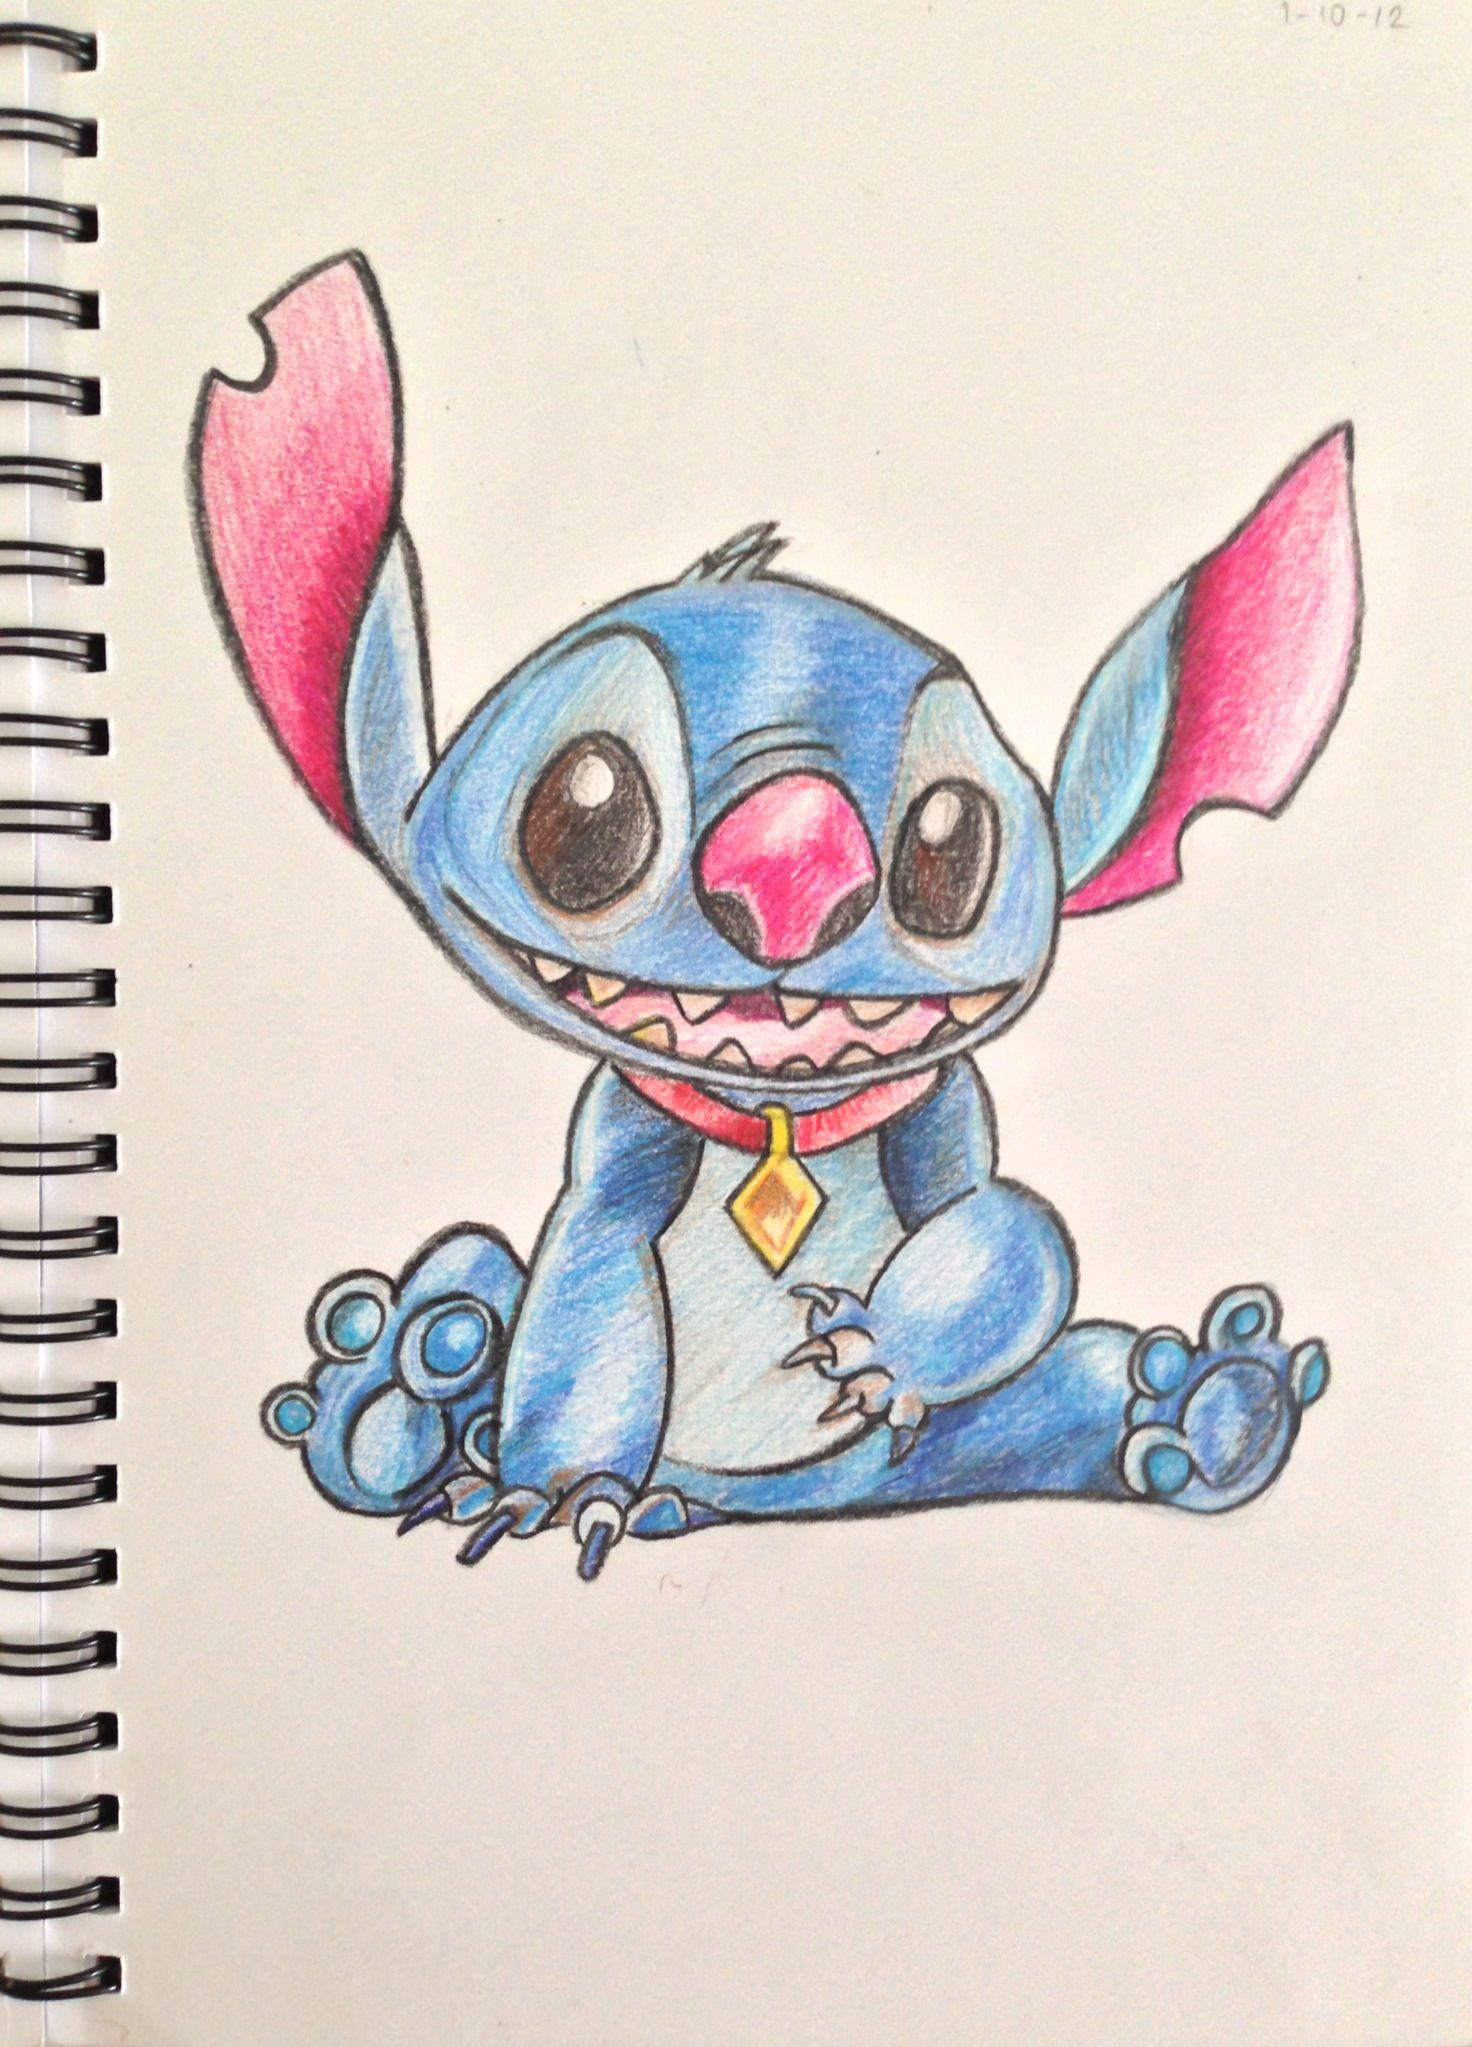 Stitch!! Inspired in the art of Joaquim Bundo!